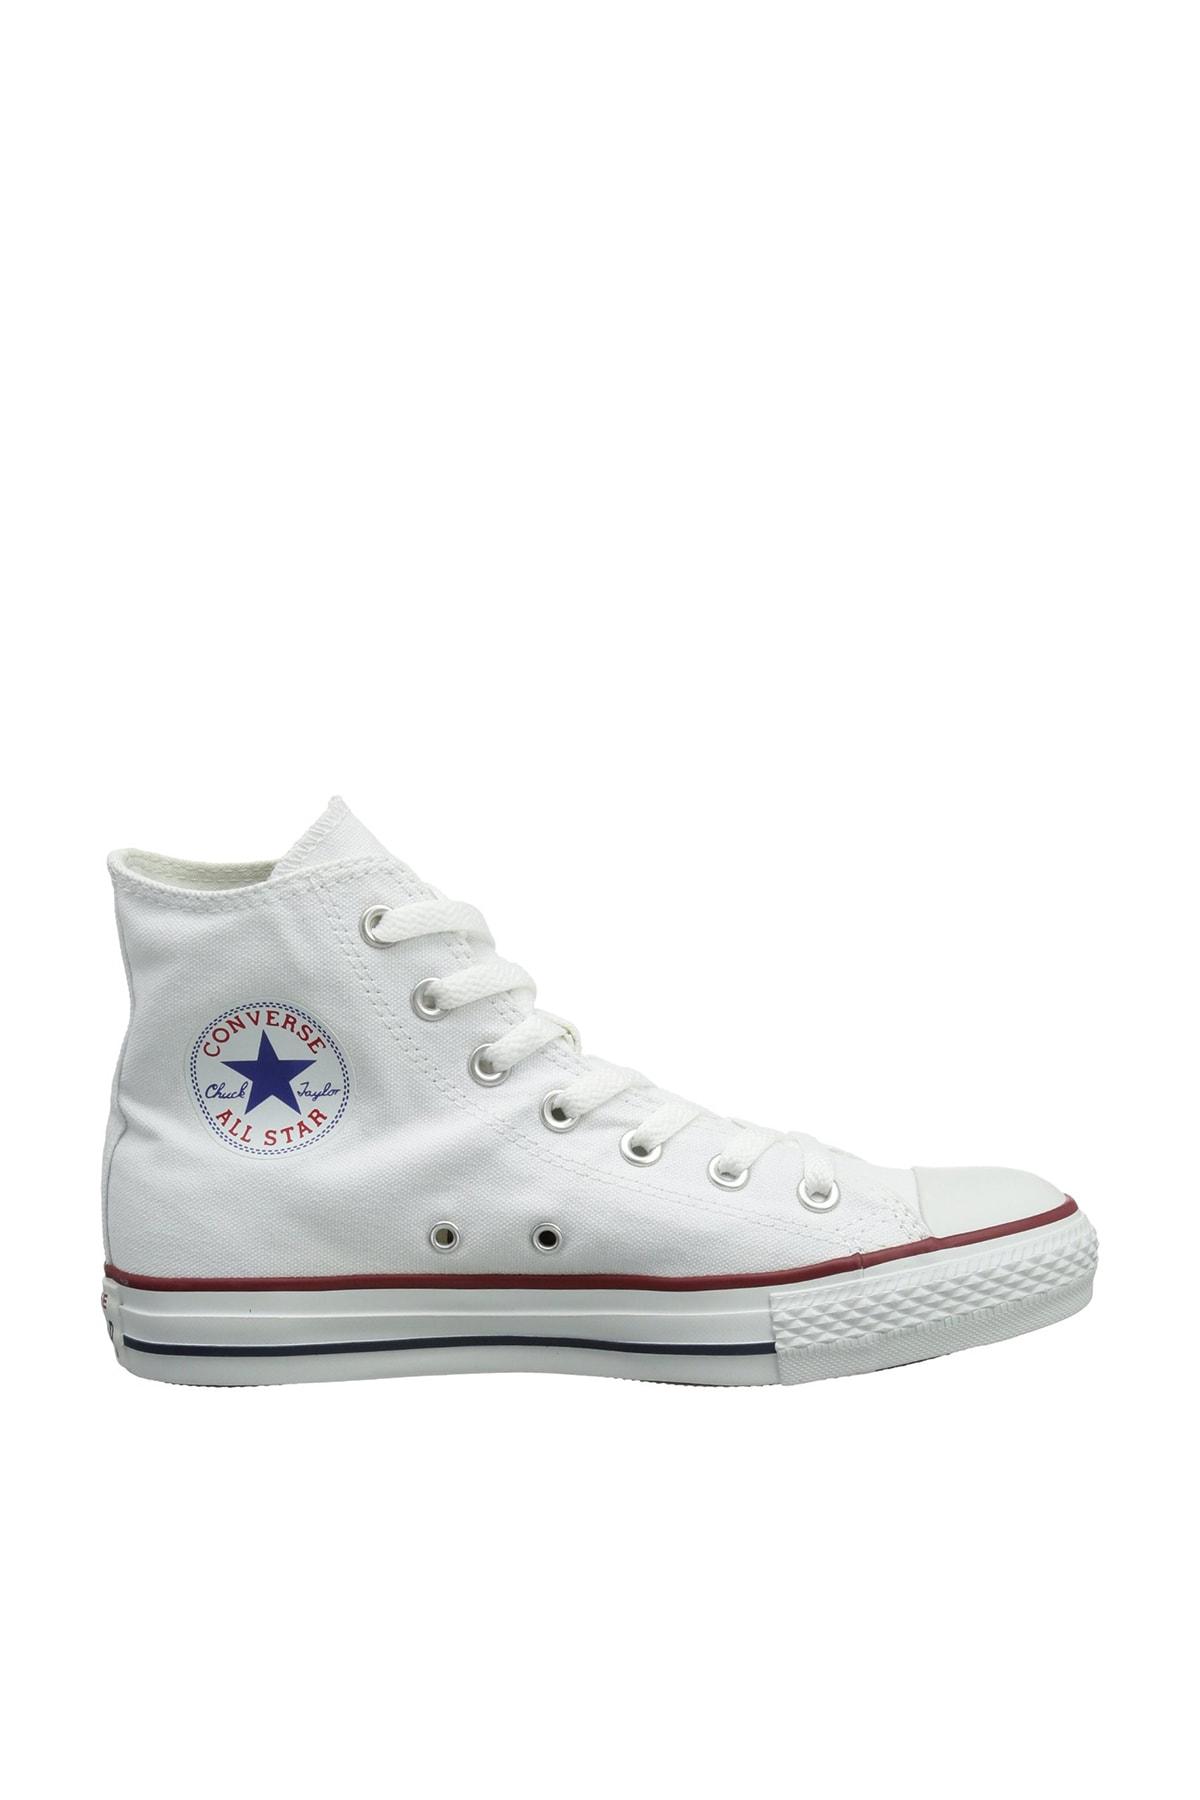 Converse Unisex Sneaker M7650